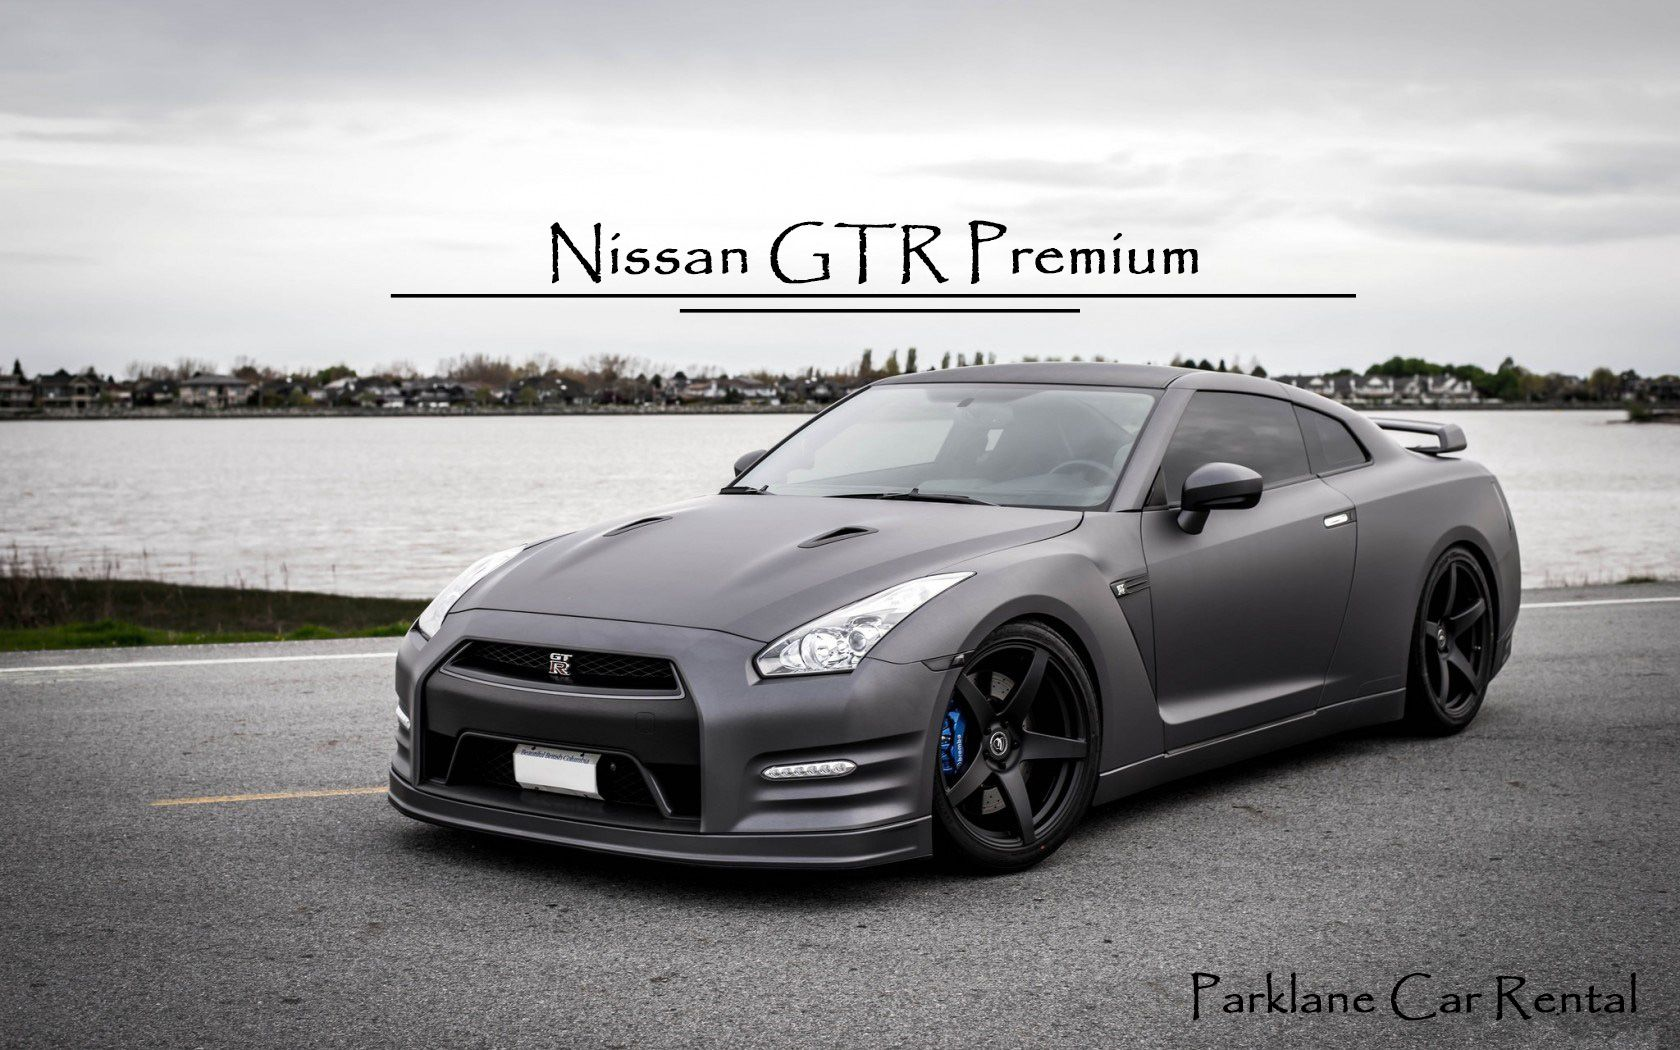 Nissan Gtr Premium Definition Of Speed In 3 Words 0 60 Mph In 2 7 Secs Rent Nissan Gtr Premium From Parklane Car Rental Visit Nissan Gtr Nissan Gtr R35 Gtr R35